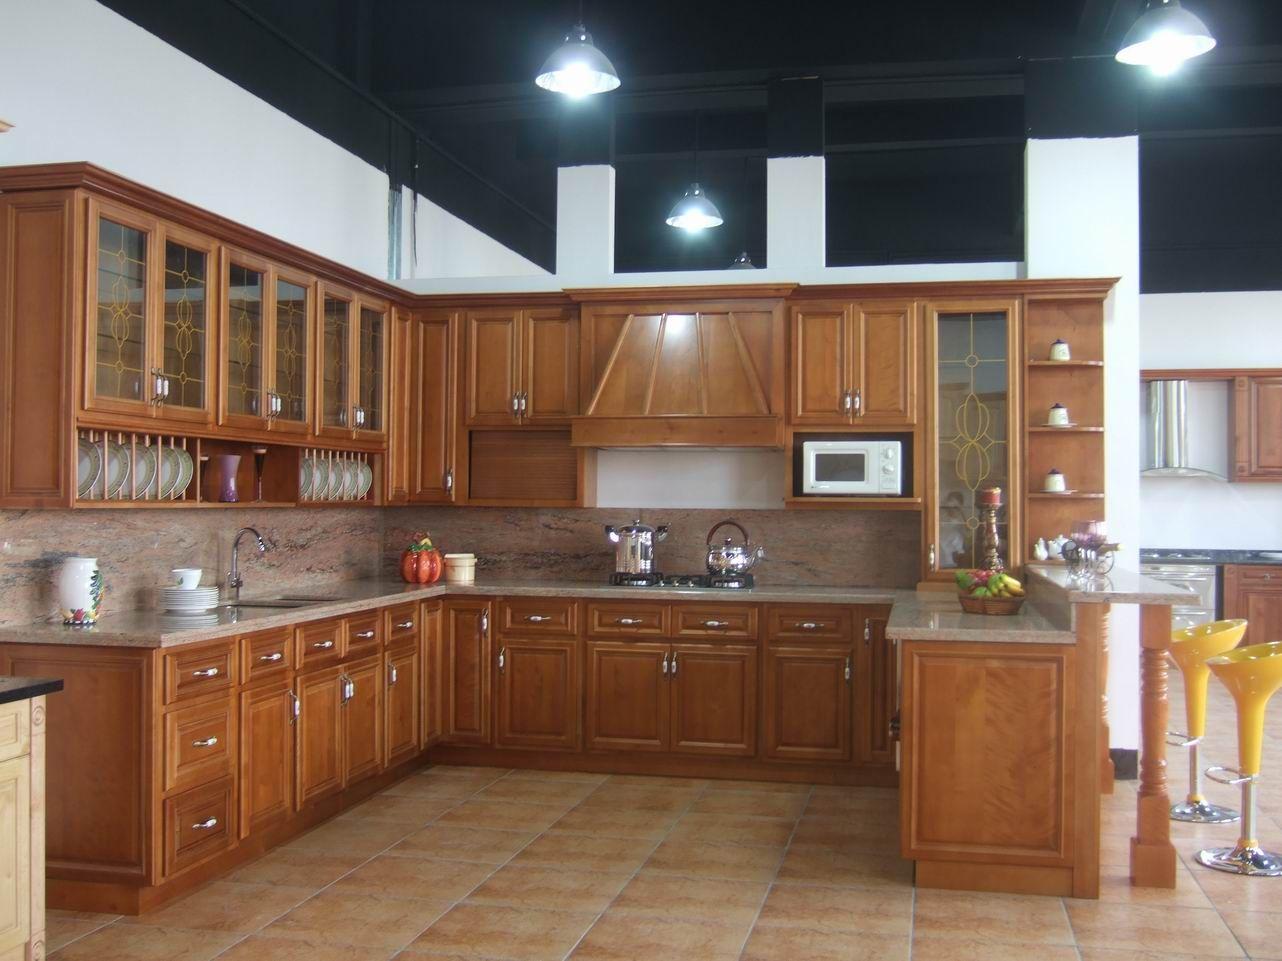 Muebles de cocina en madera por metro lineal cartago for Modelos cocinas integrales modernas